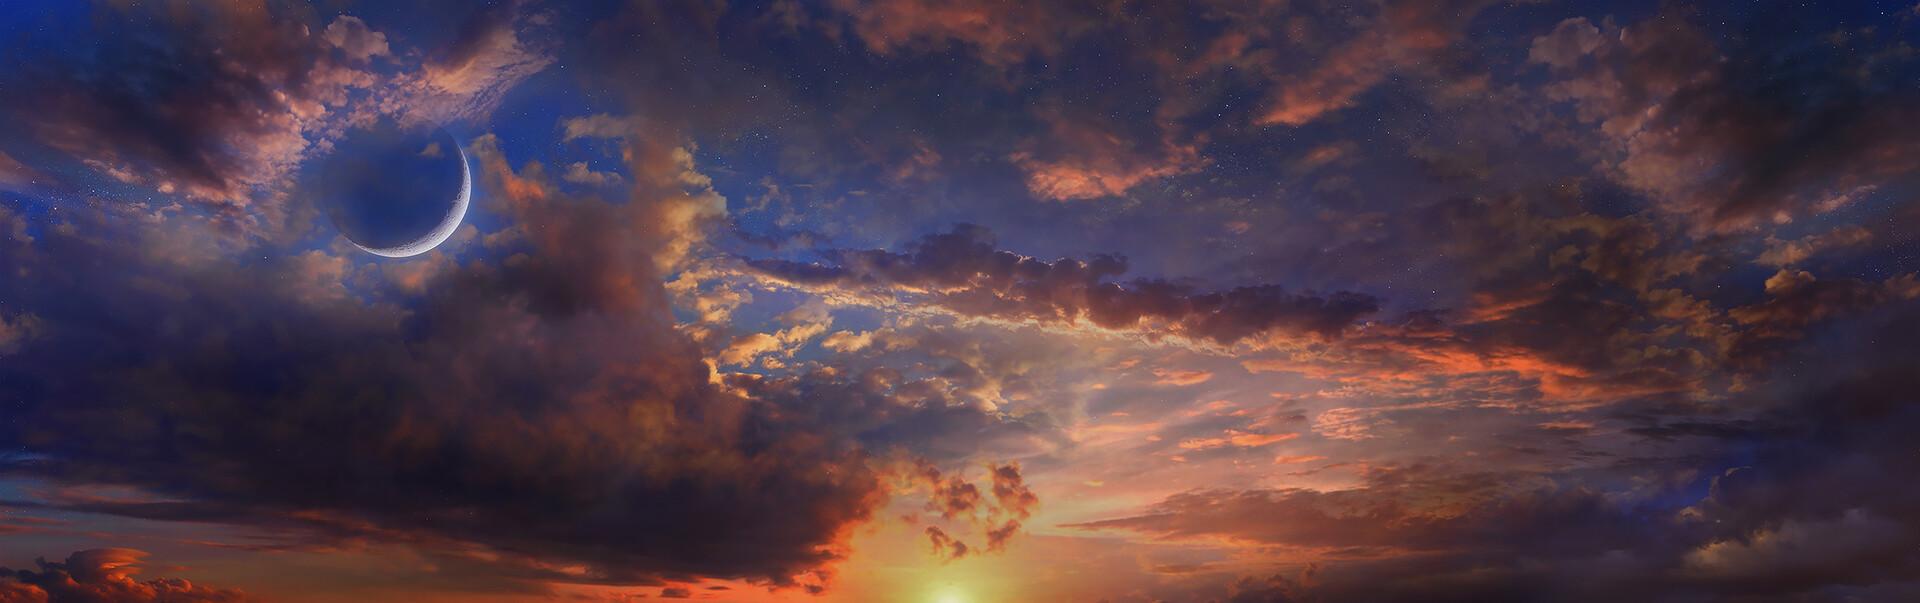 Scott richard sunset 052819 by scott richard